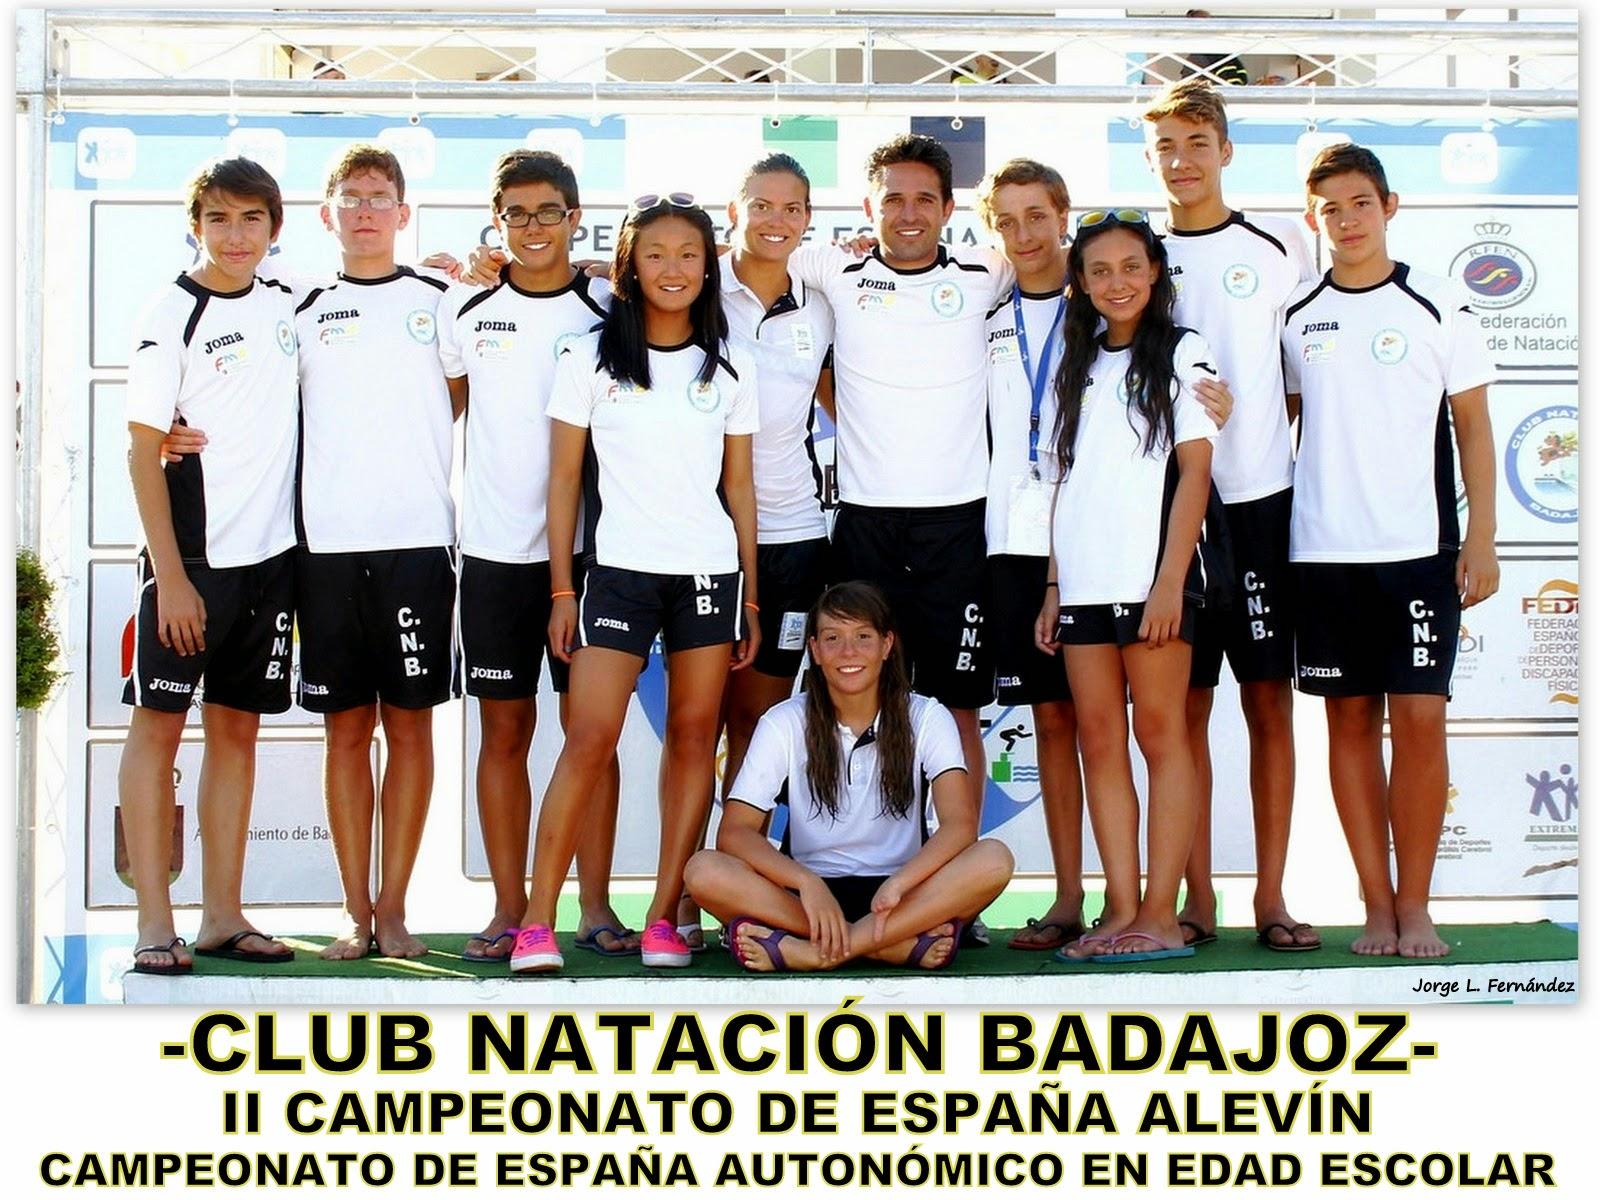 Cto. de España Alevín y Escolar (Badajoz 2014)